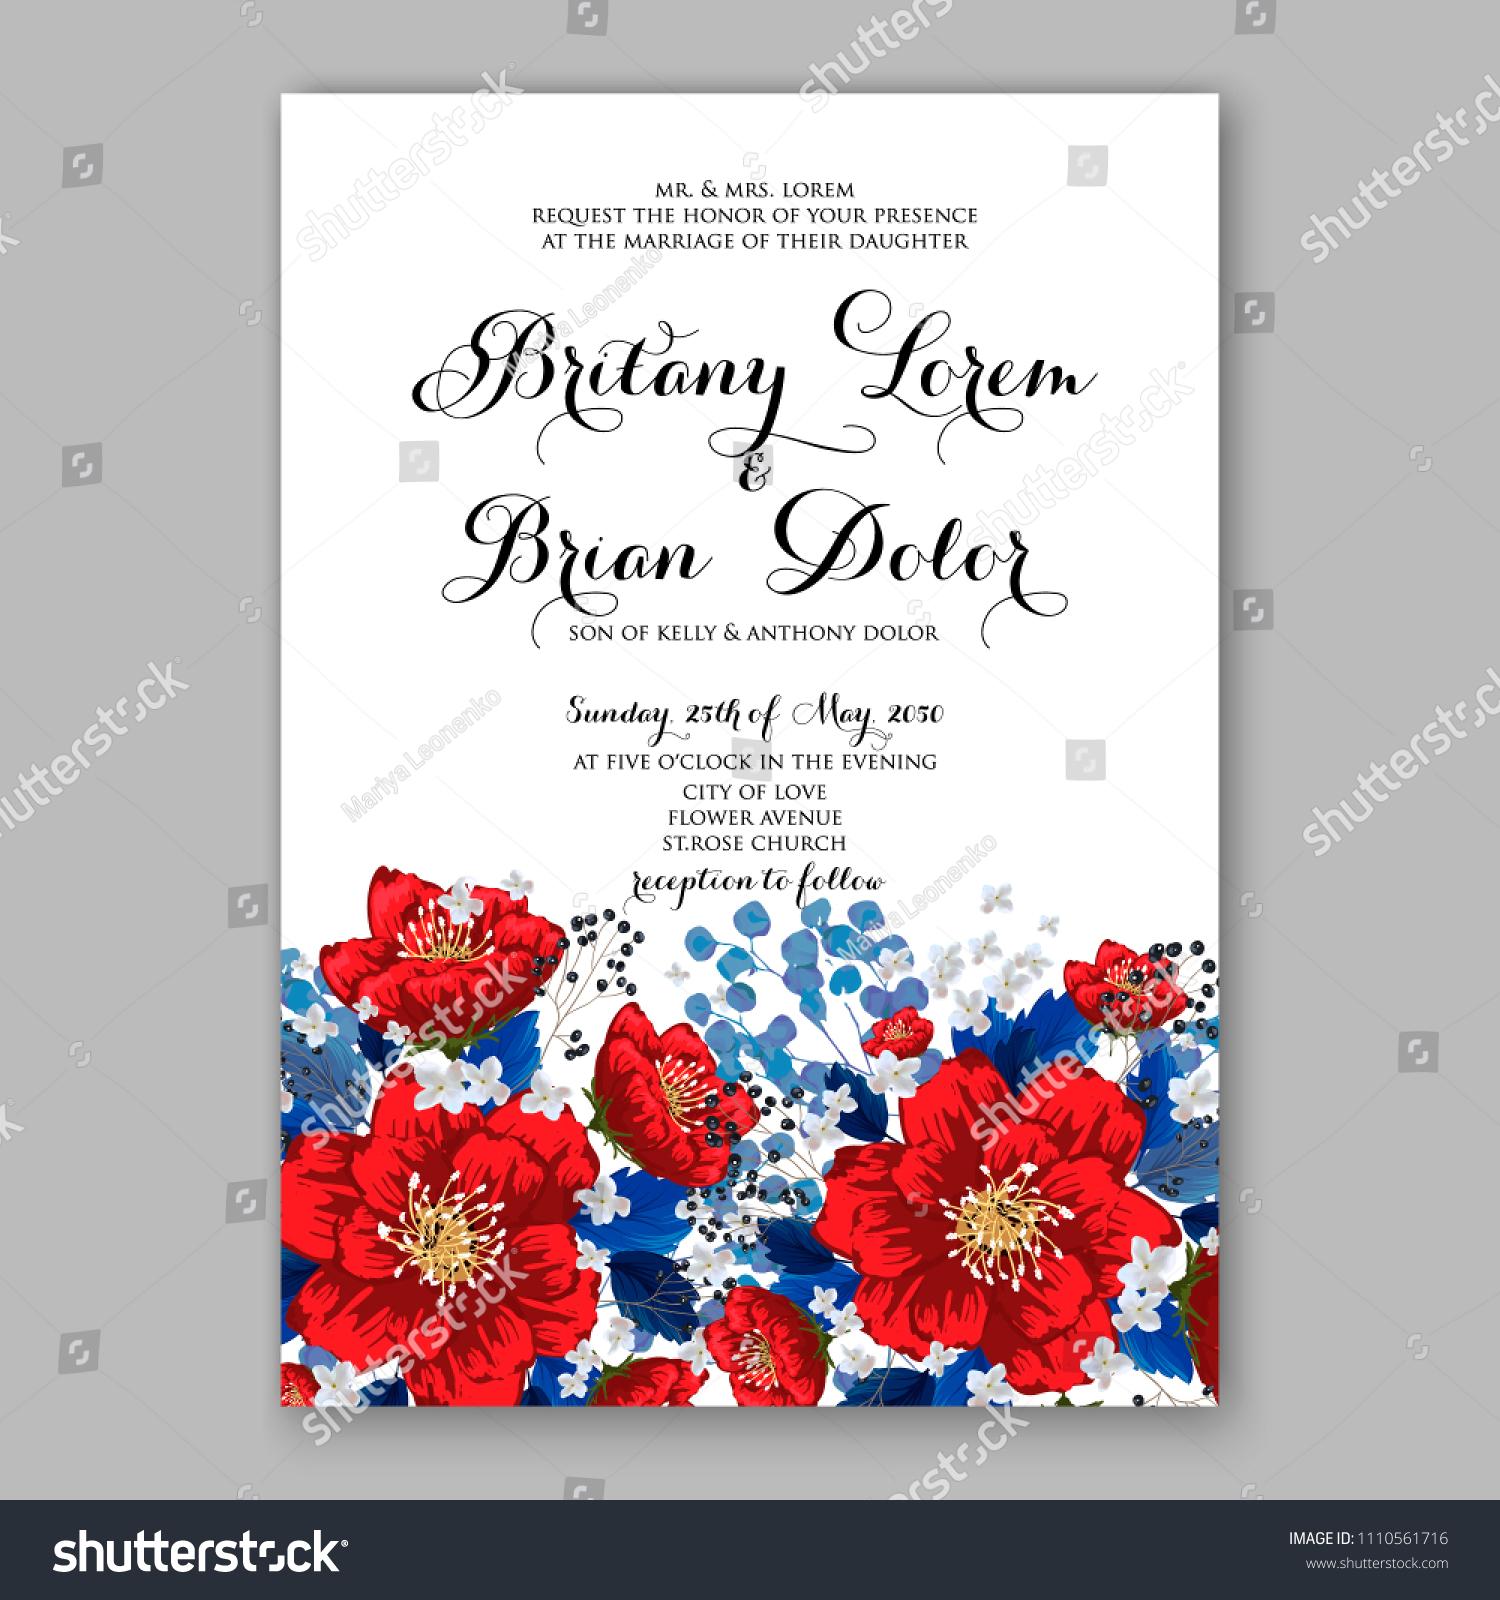 Floral Wedding Invitation Vector Card Template Stock Vector (Royalty ...